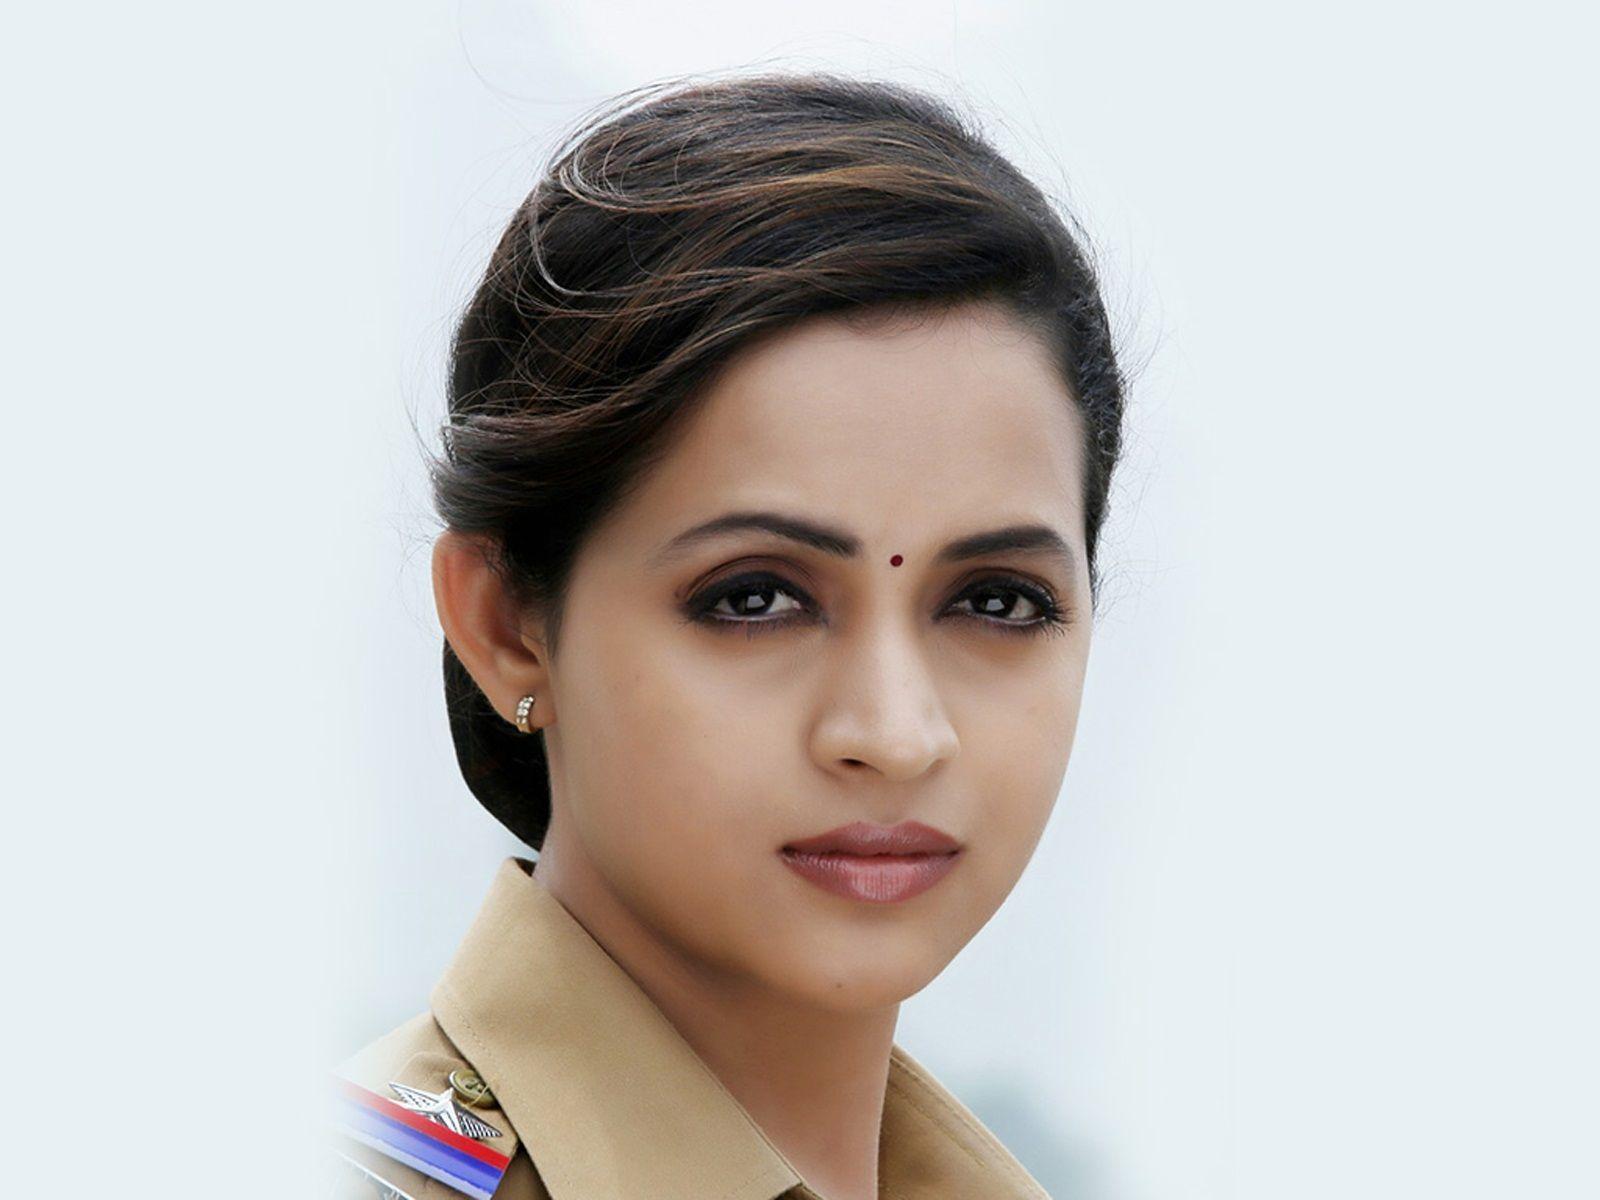 Tamil Actress Hd Wallpapers Wallpaper Cave